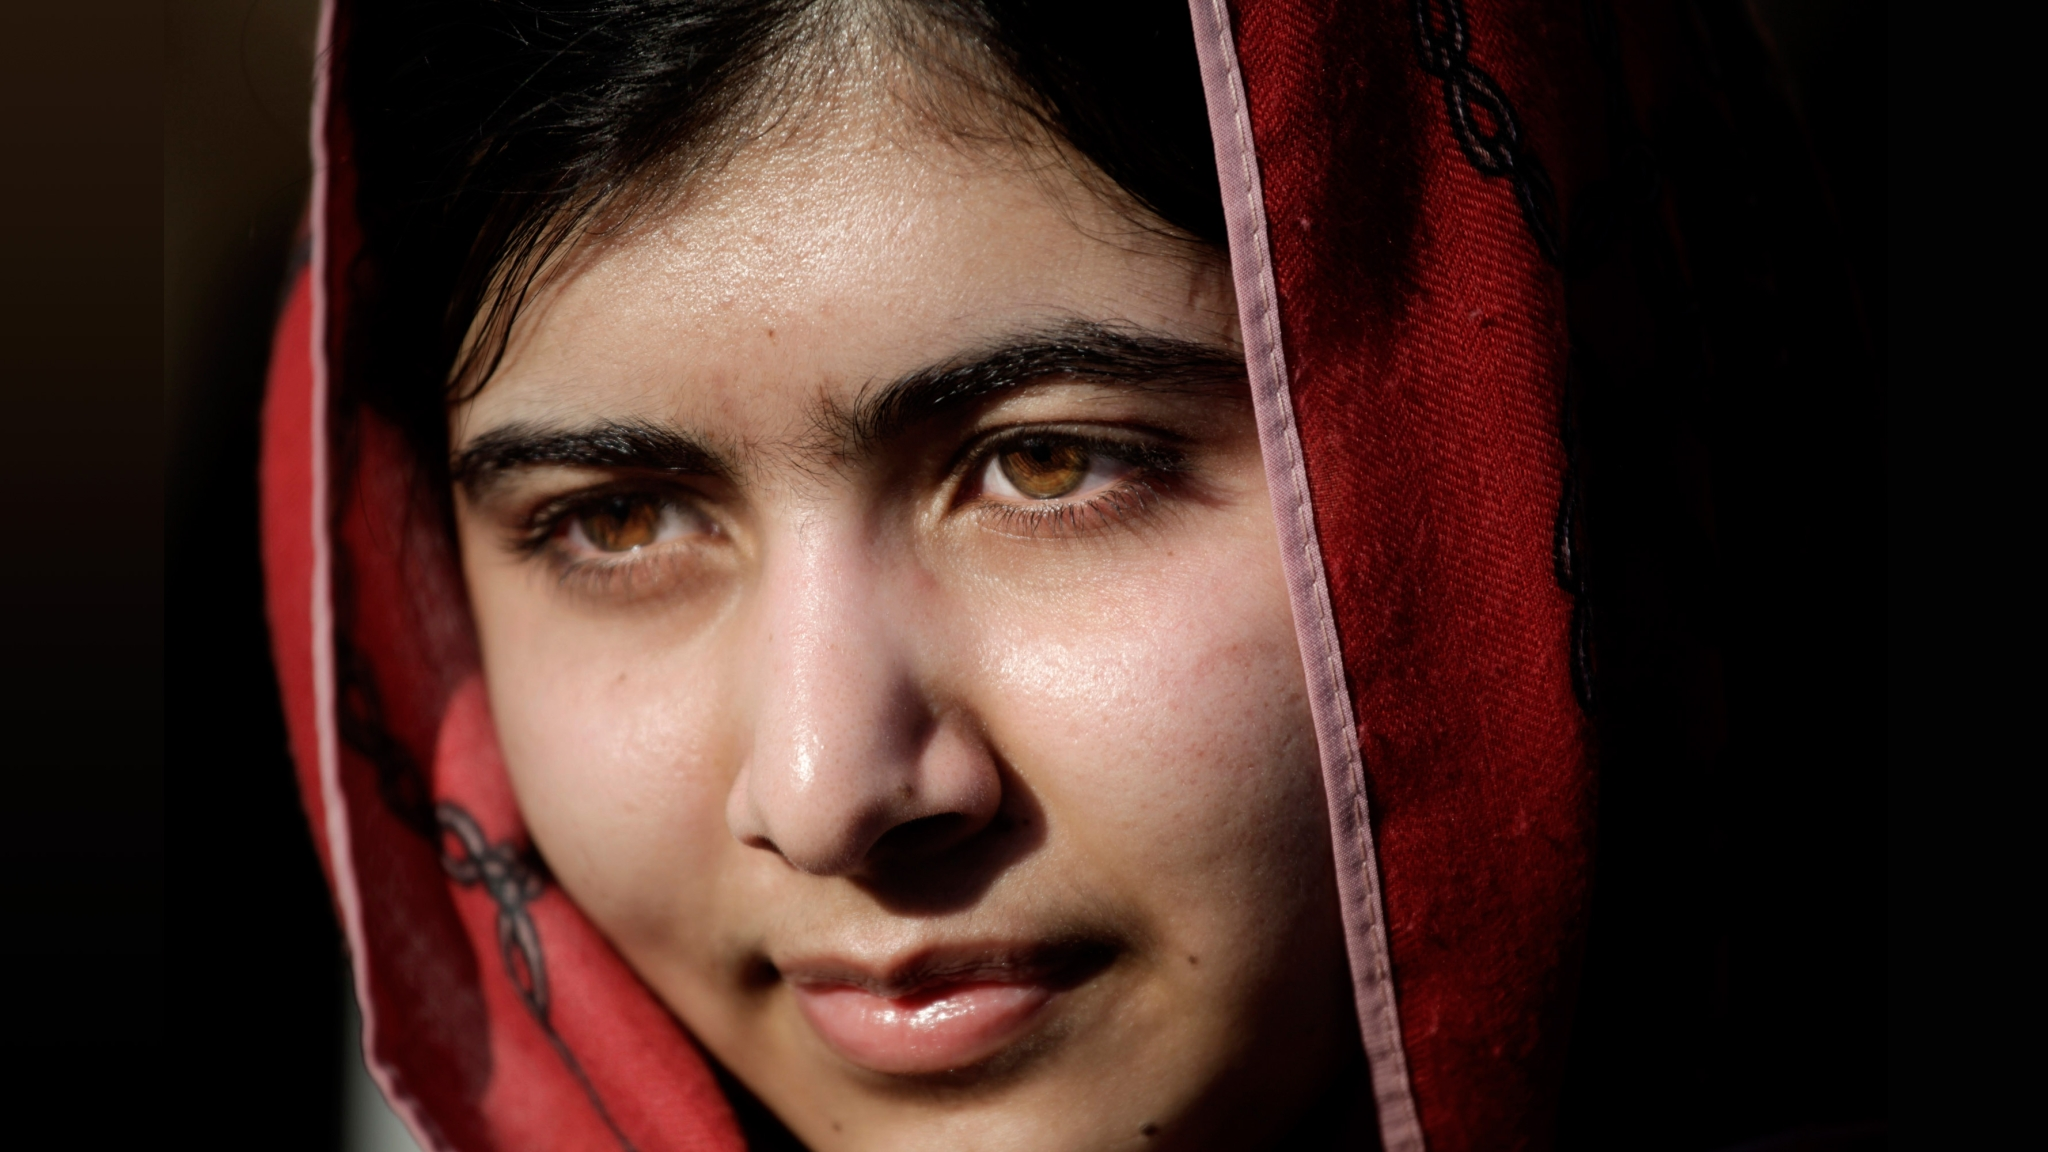 Malala's Tweet Urging UN to Help Kashmiri Children Evokes Anger